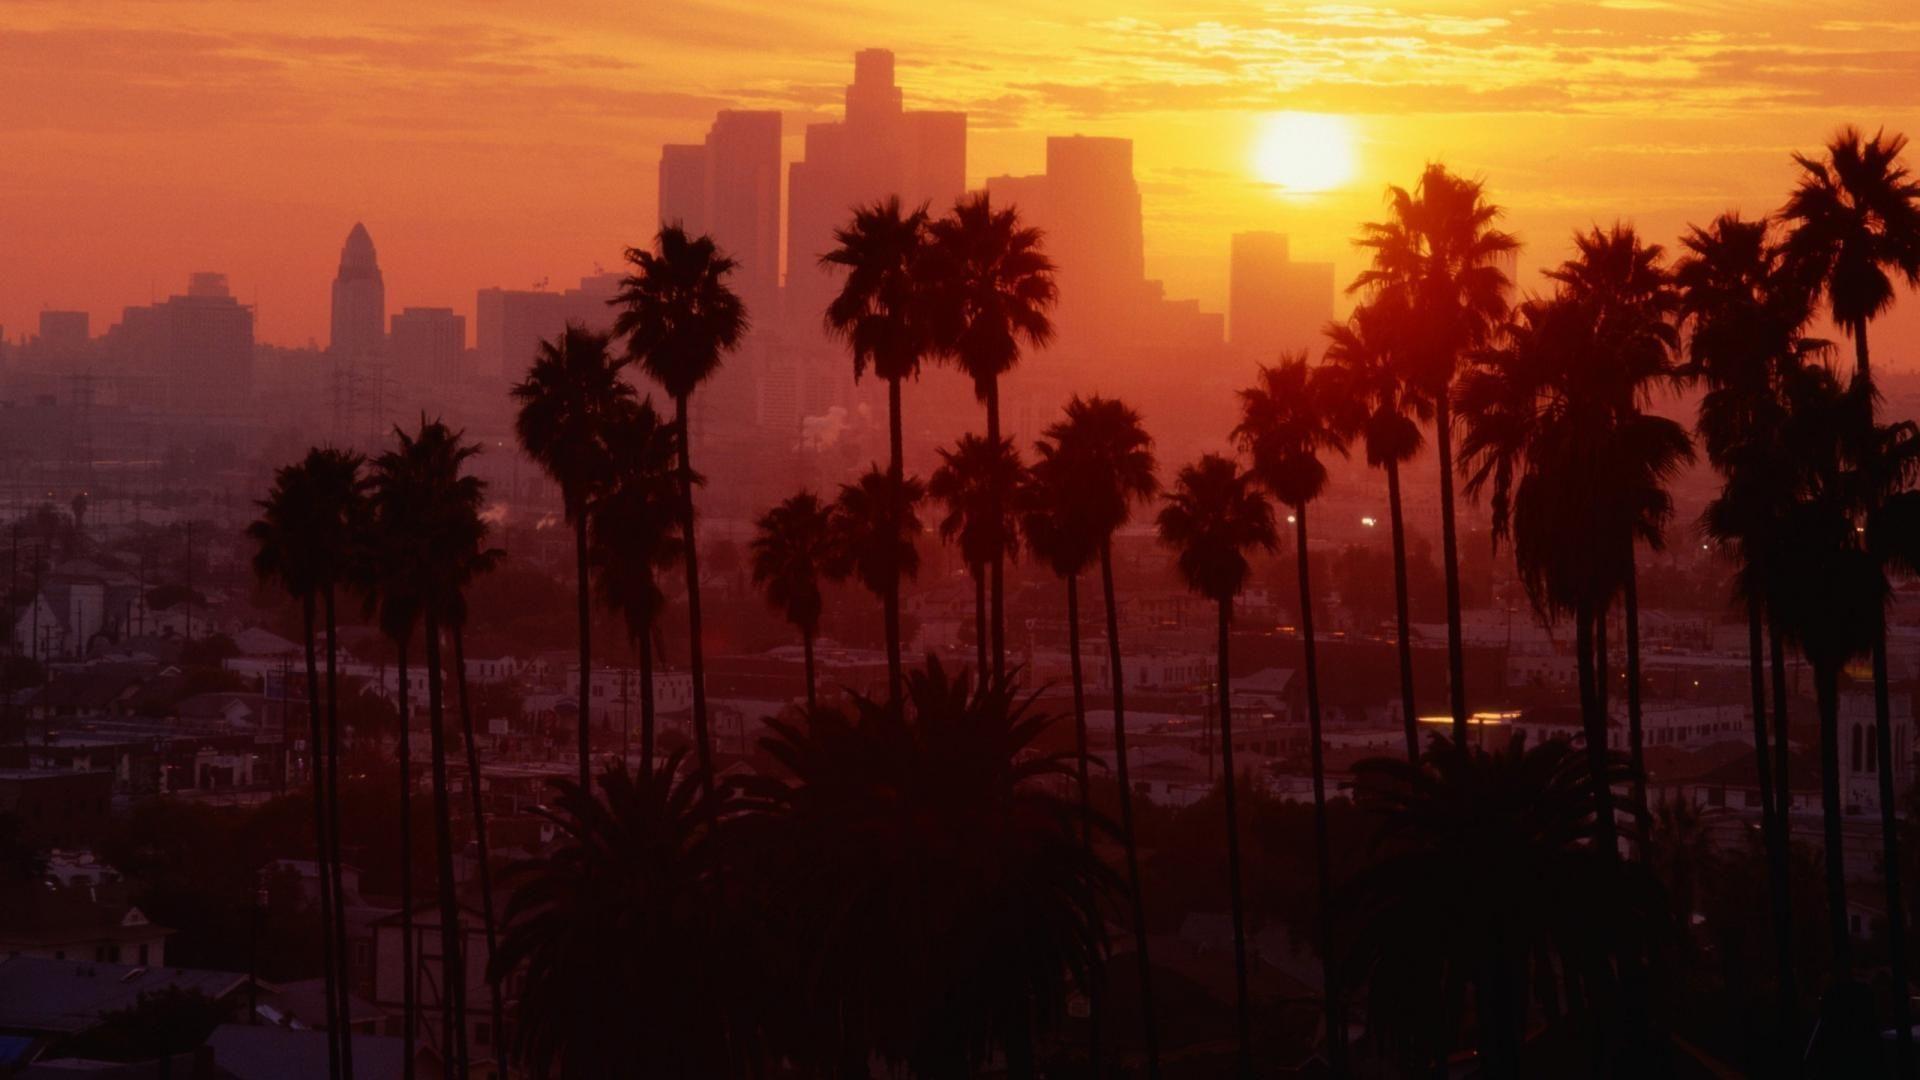 California Sunset Wallpapers Top Free California Sunset Backgrounds Wallpaperaccess